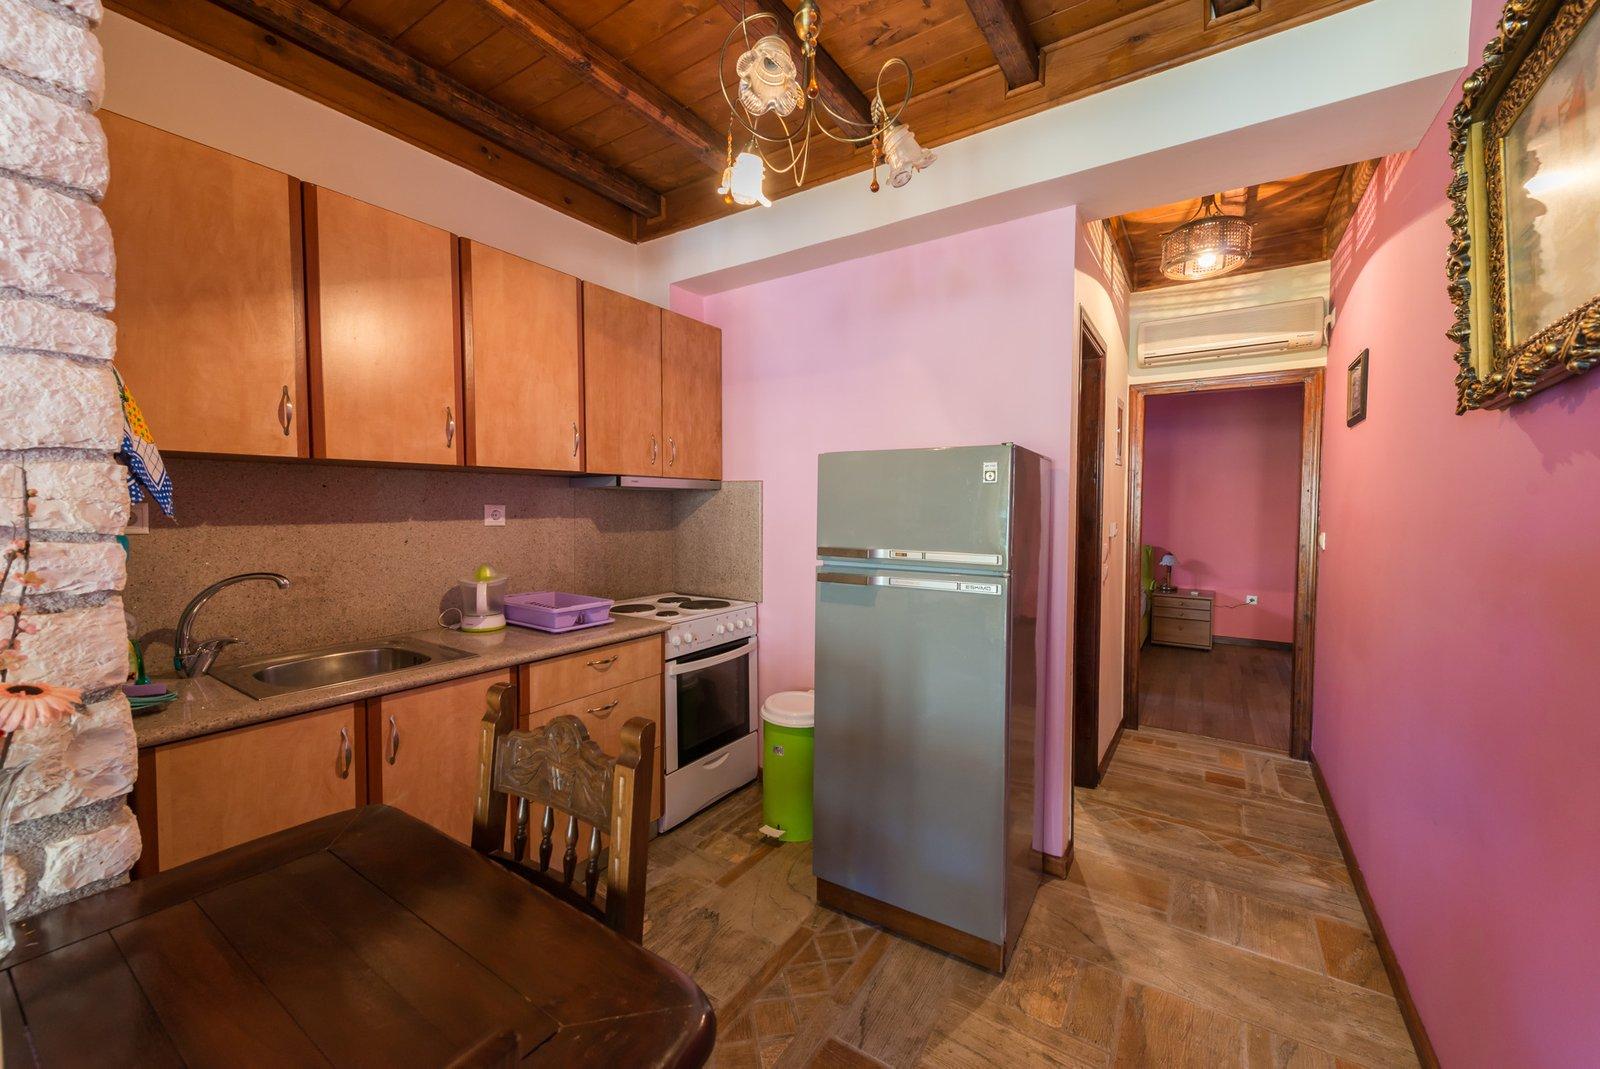 Laertis kitchen